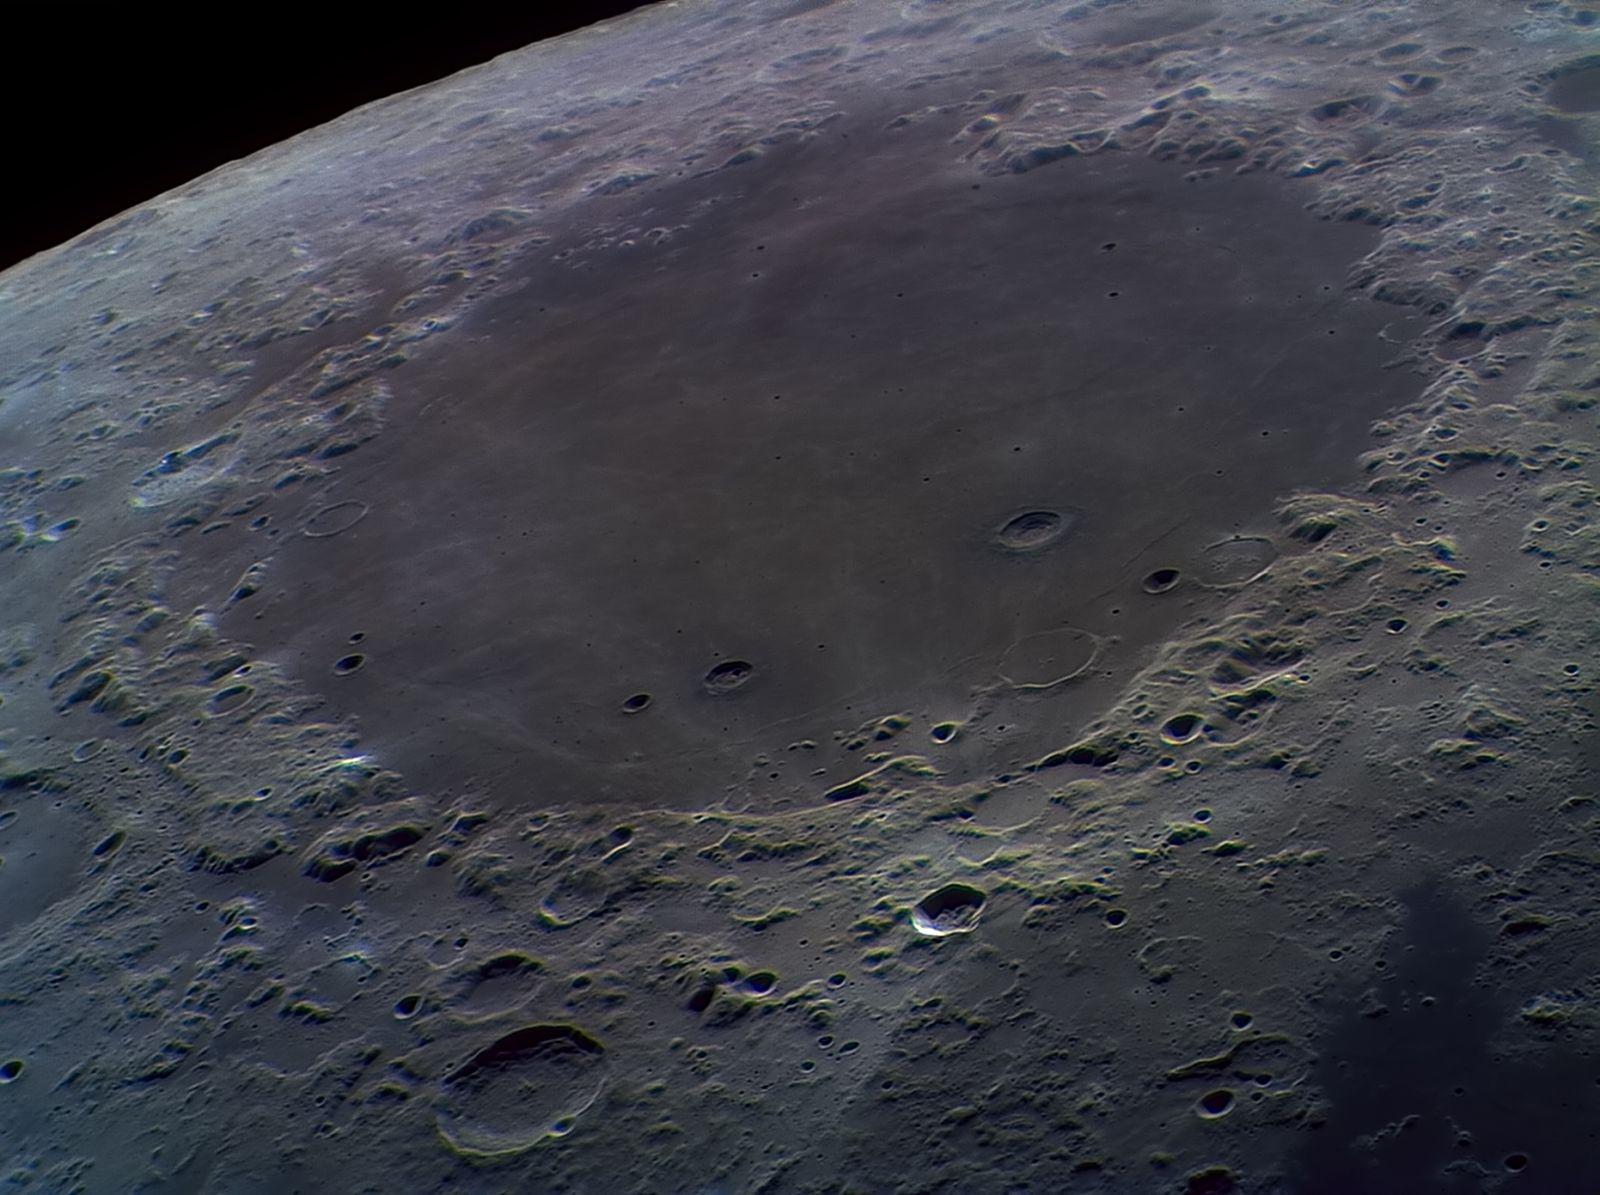 Изображение моря кризисов на Луне